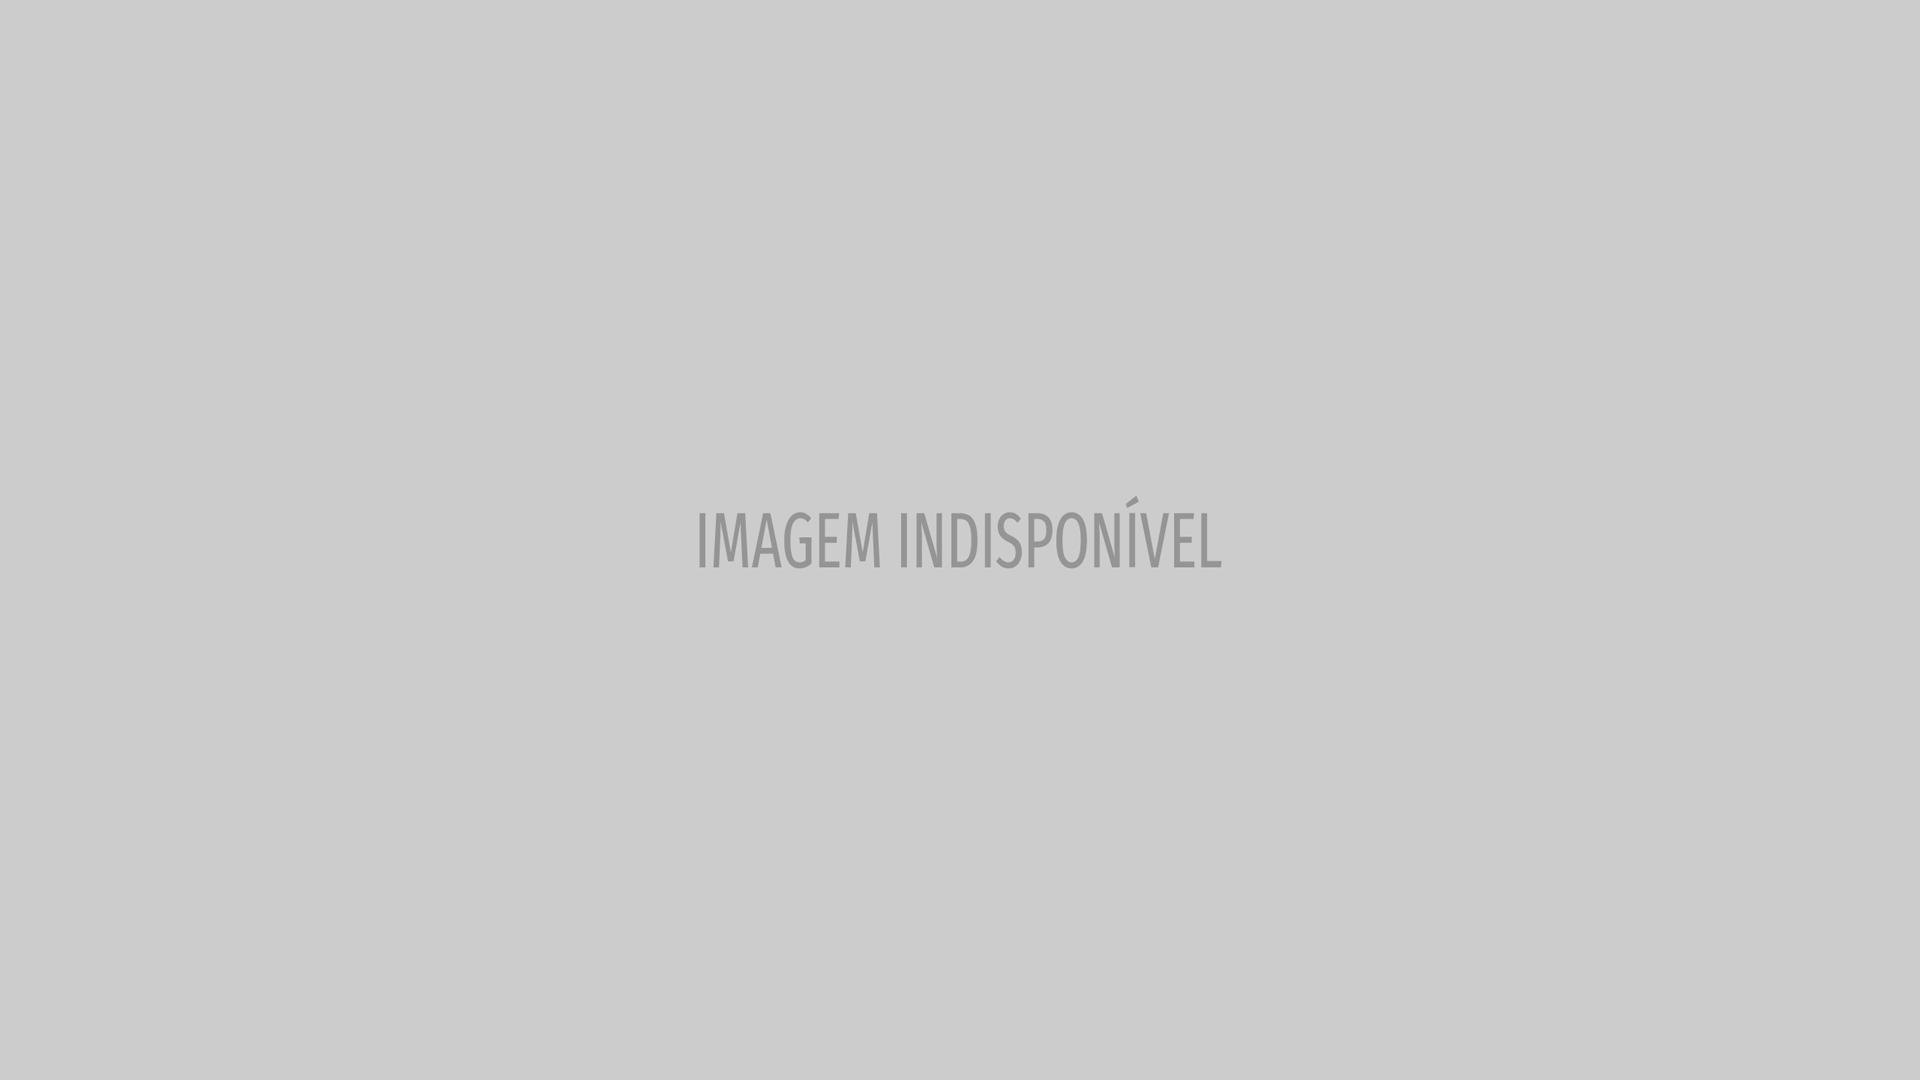 Madonna volta a passear por Lisboa à noite